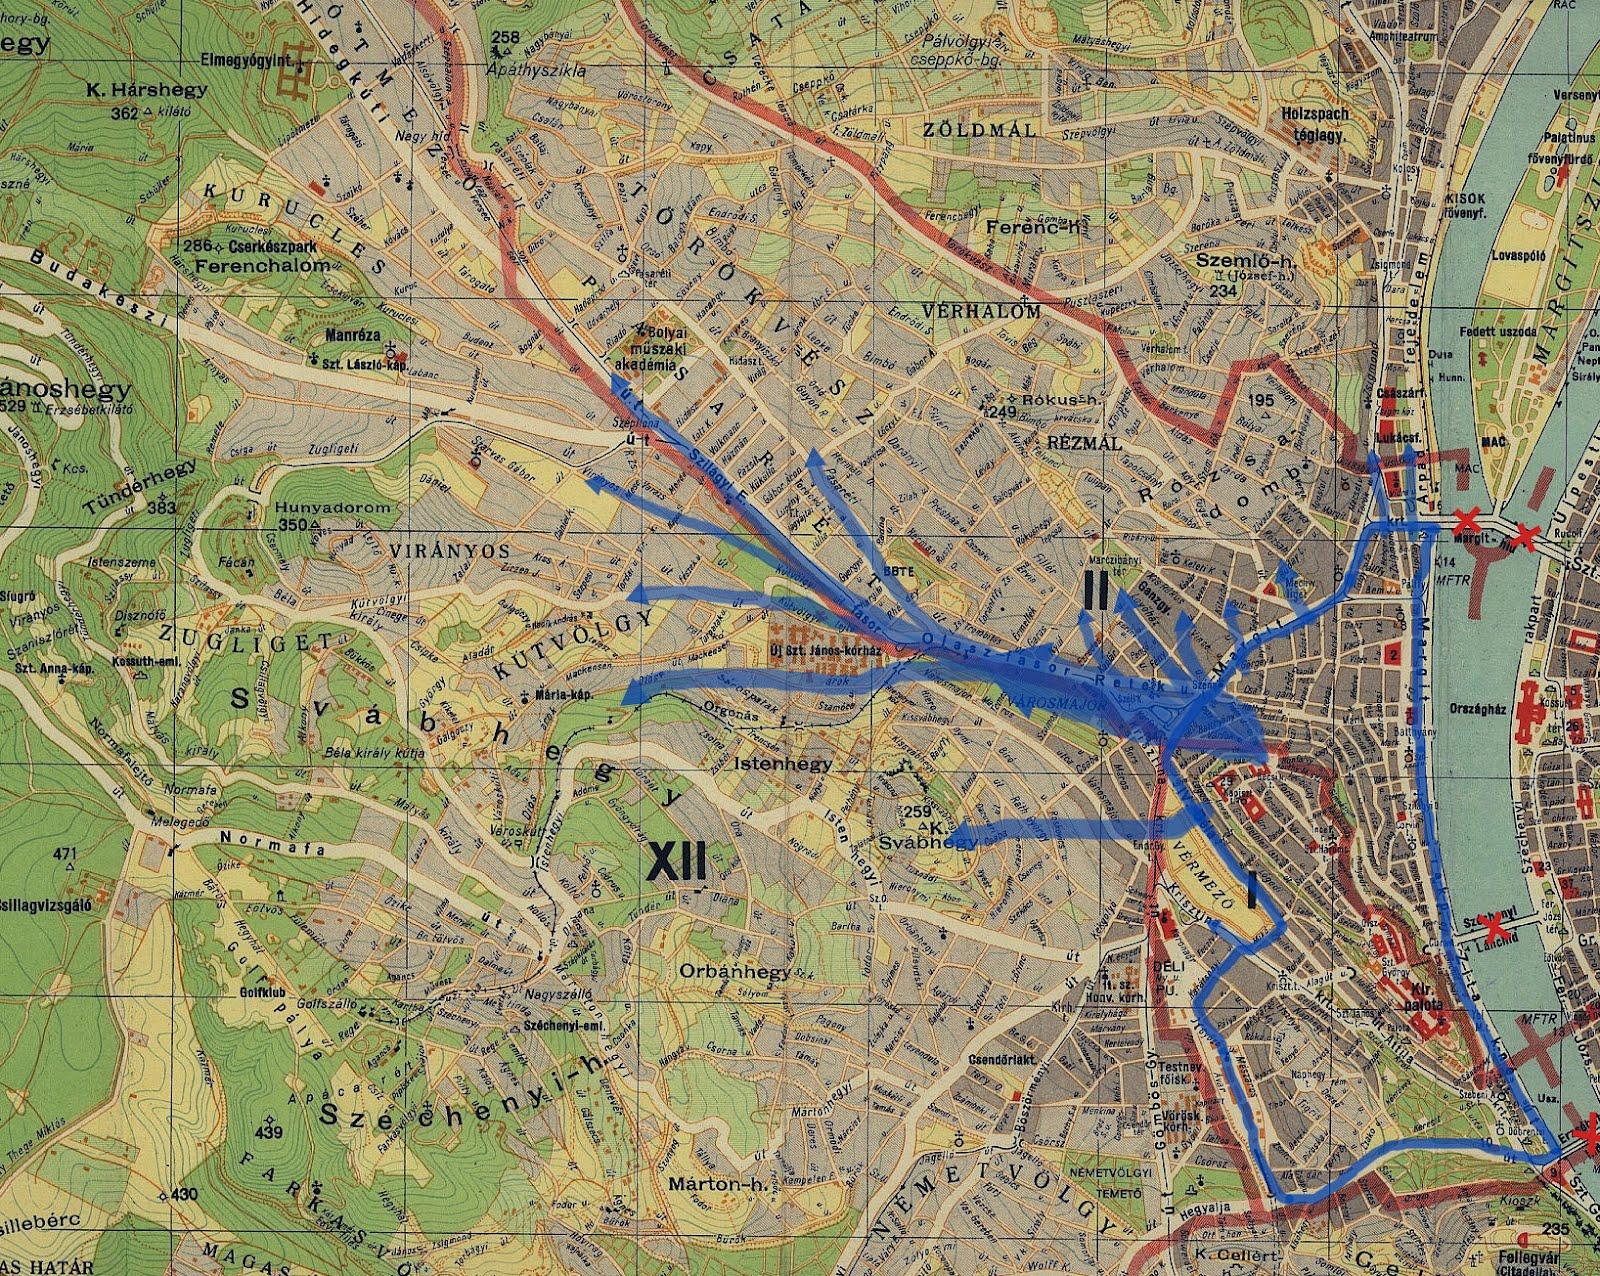 budapest ostroma térkép Budapest, capital of Hungary   New map suggesion   Passed to  budapest ostroma térkép